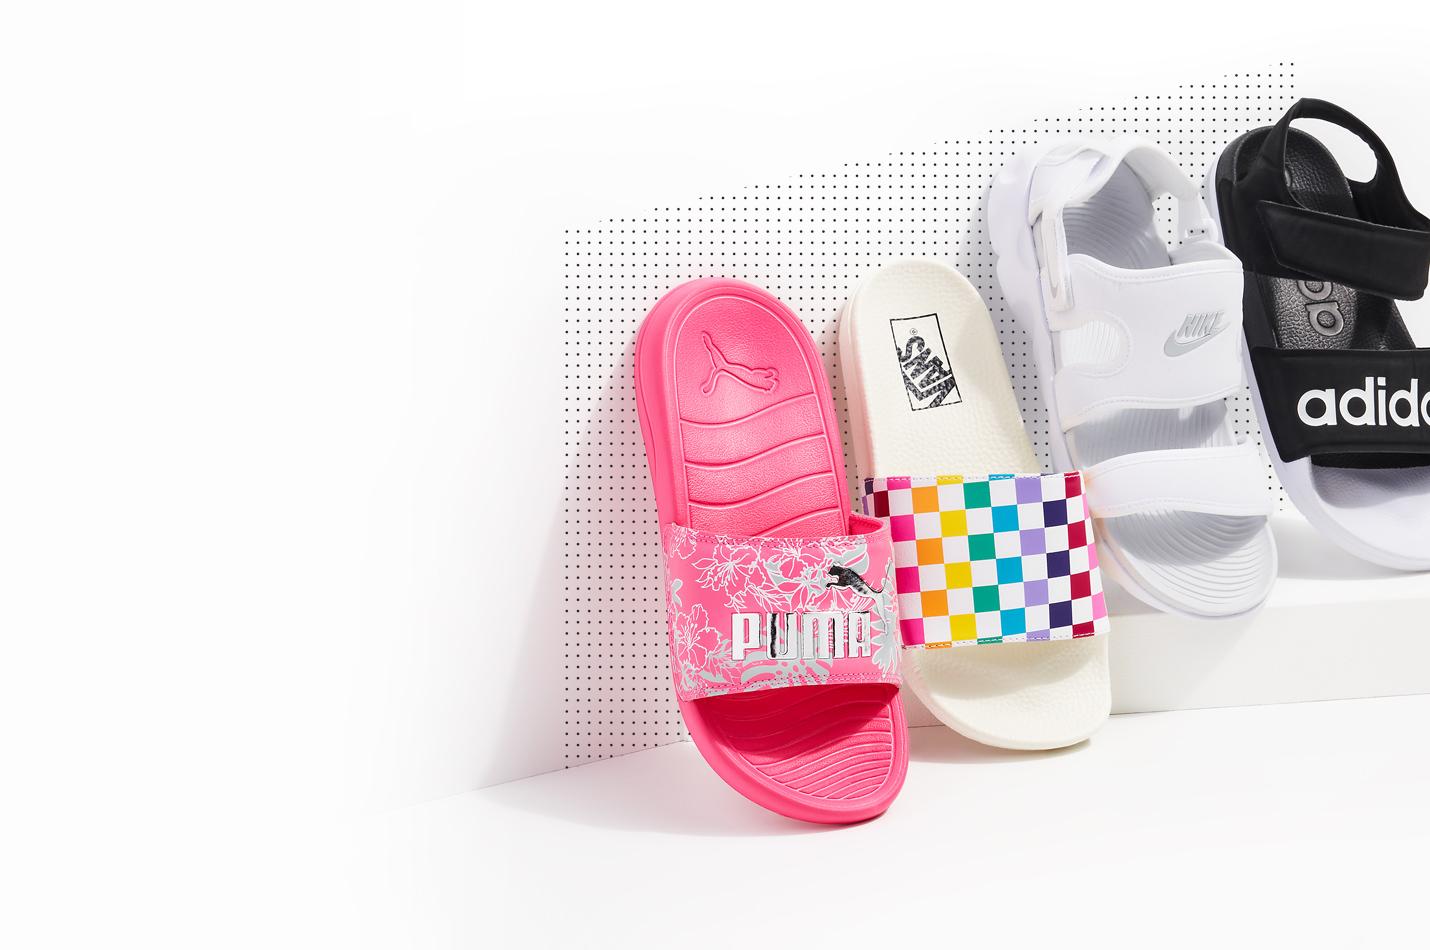 puma, vans, adidas, nike, sandals and slides